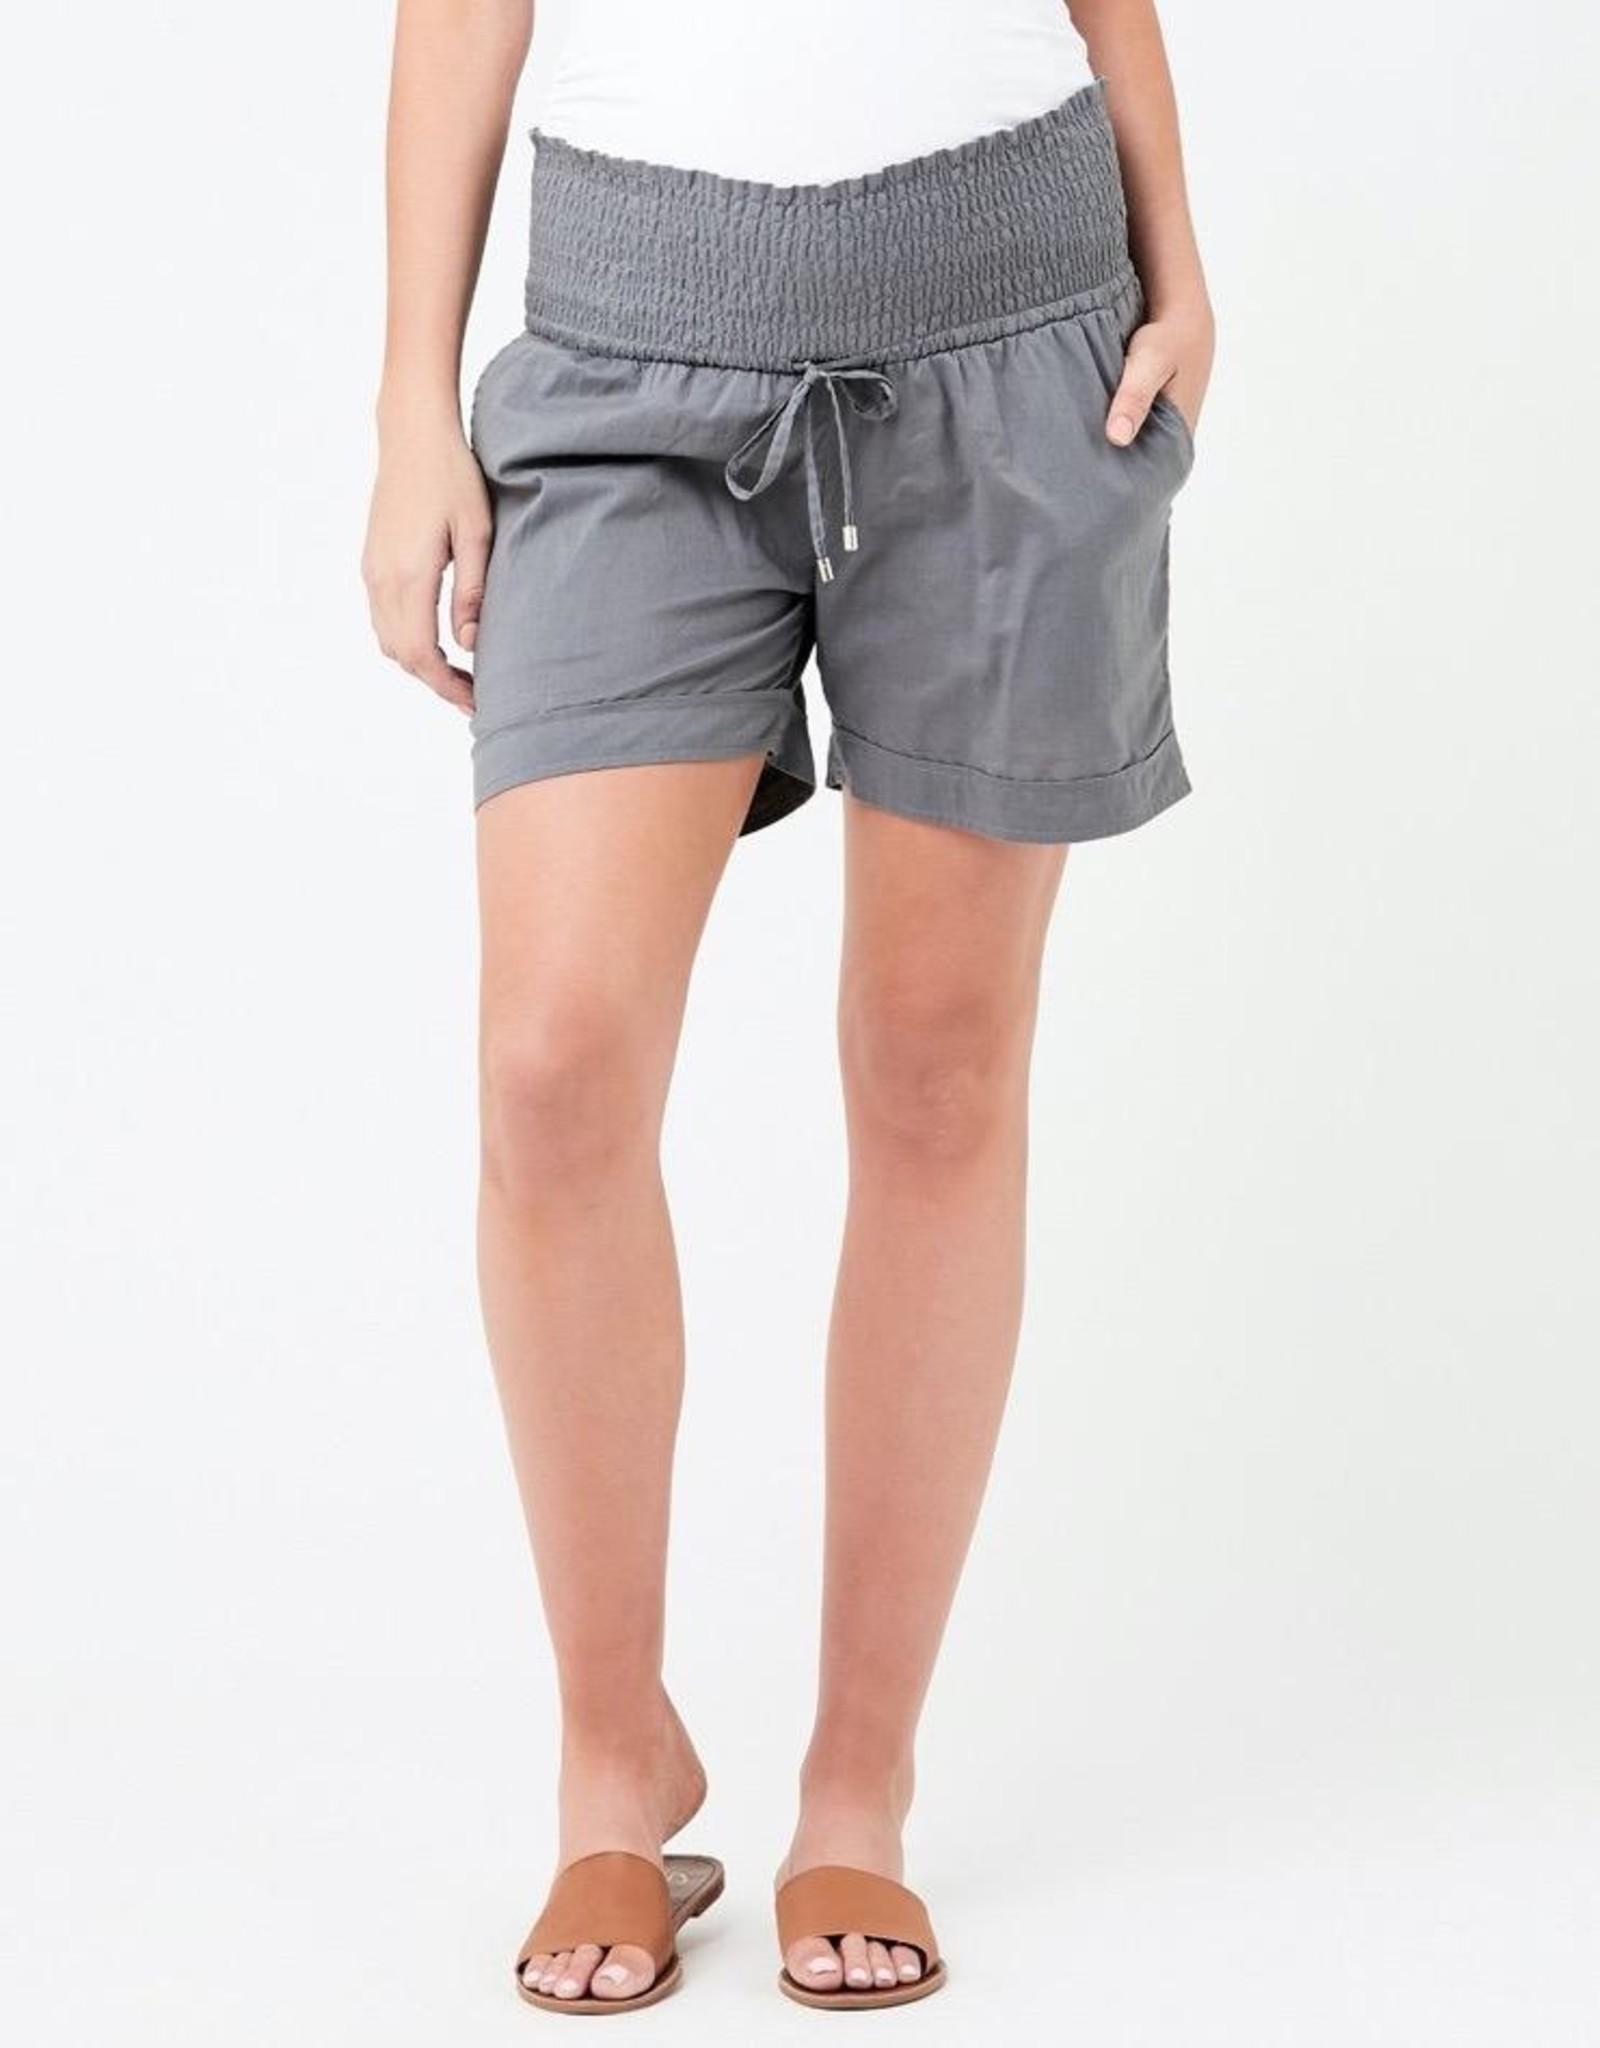 Ripe Maternity Philly Cotton Short in Sulphur